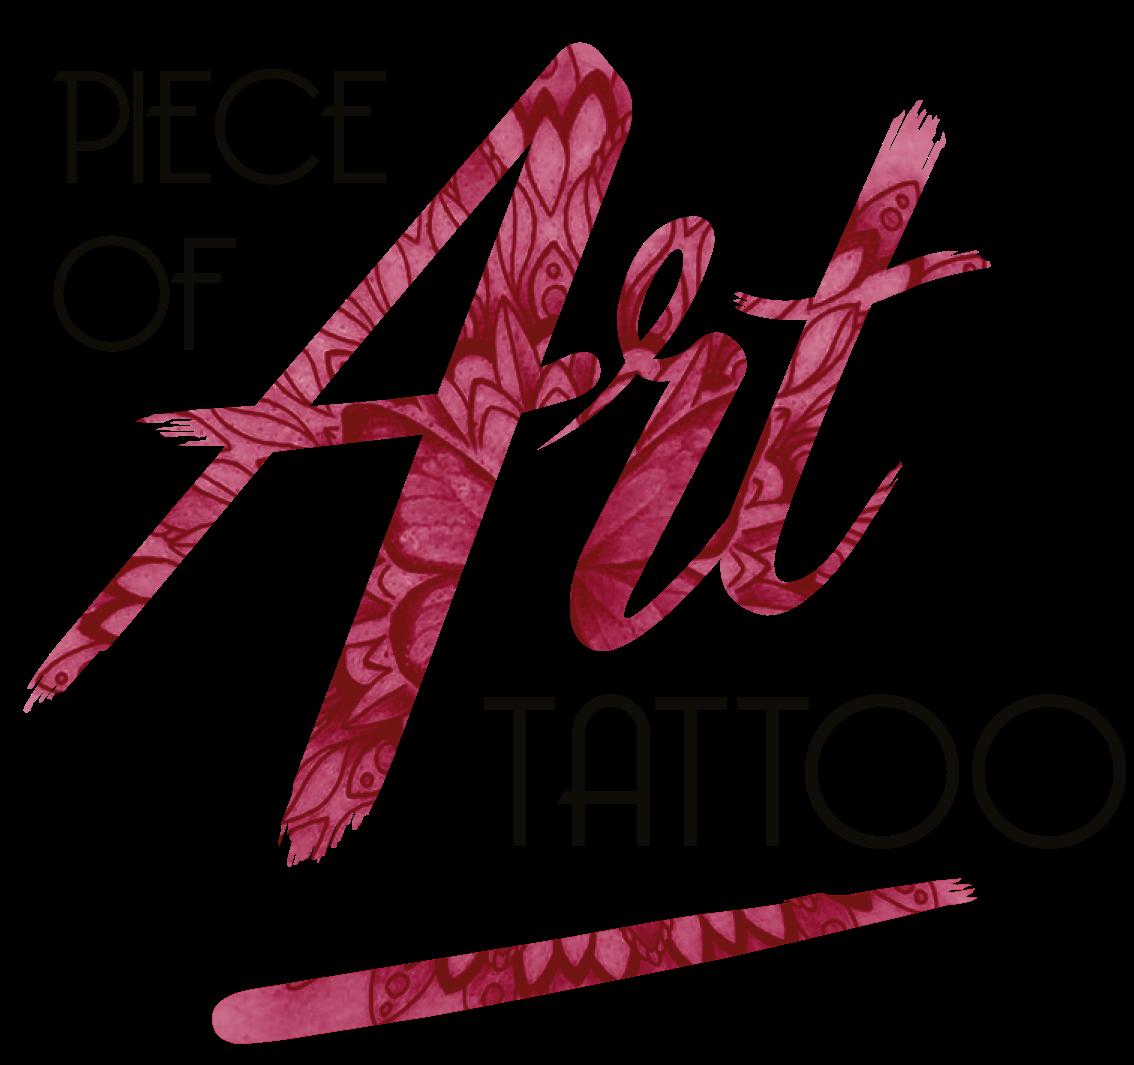 Website laten maken - PieceOfArtTattoo logo zwartletter Zonder Website